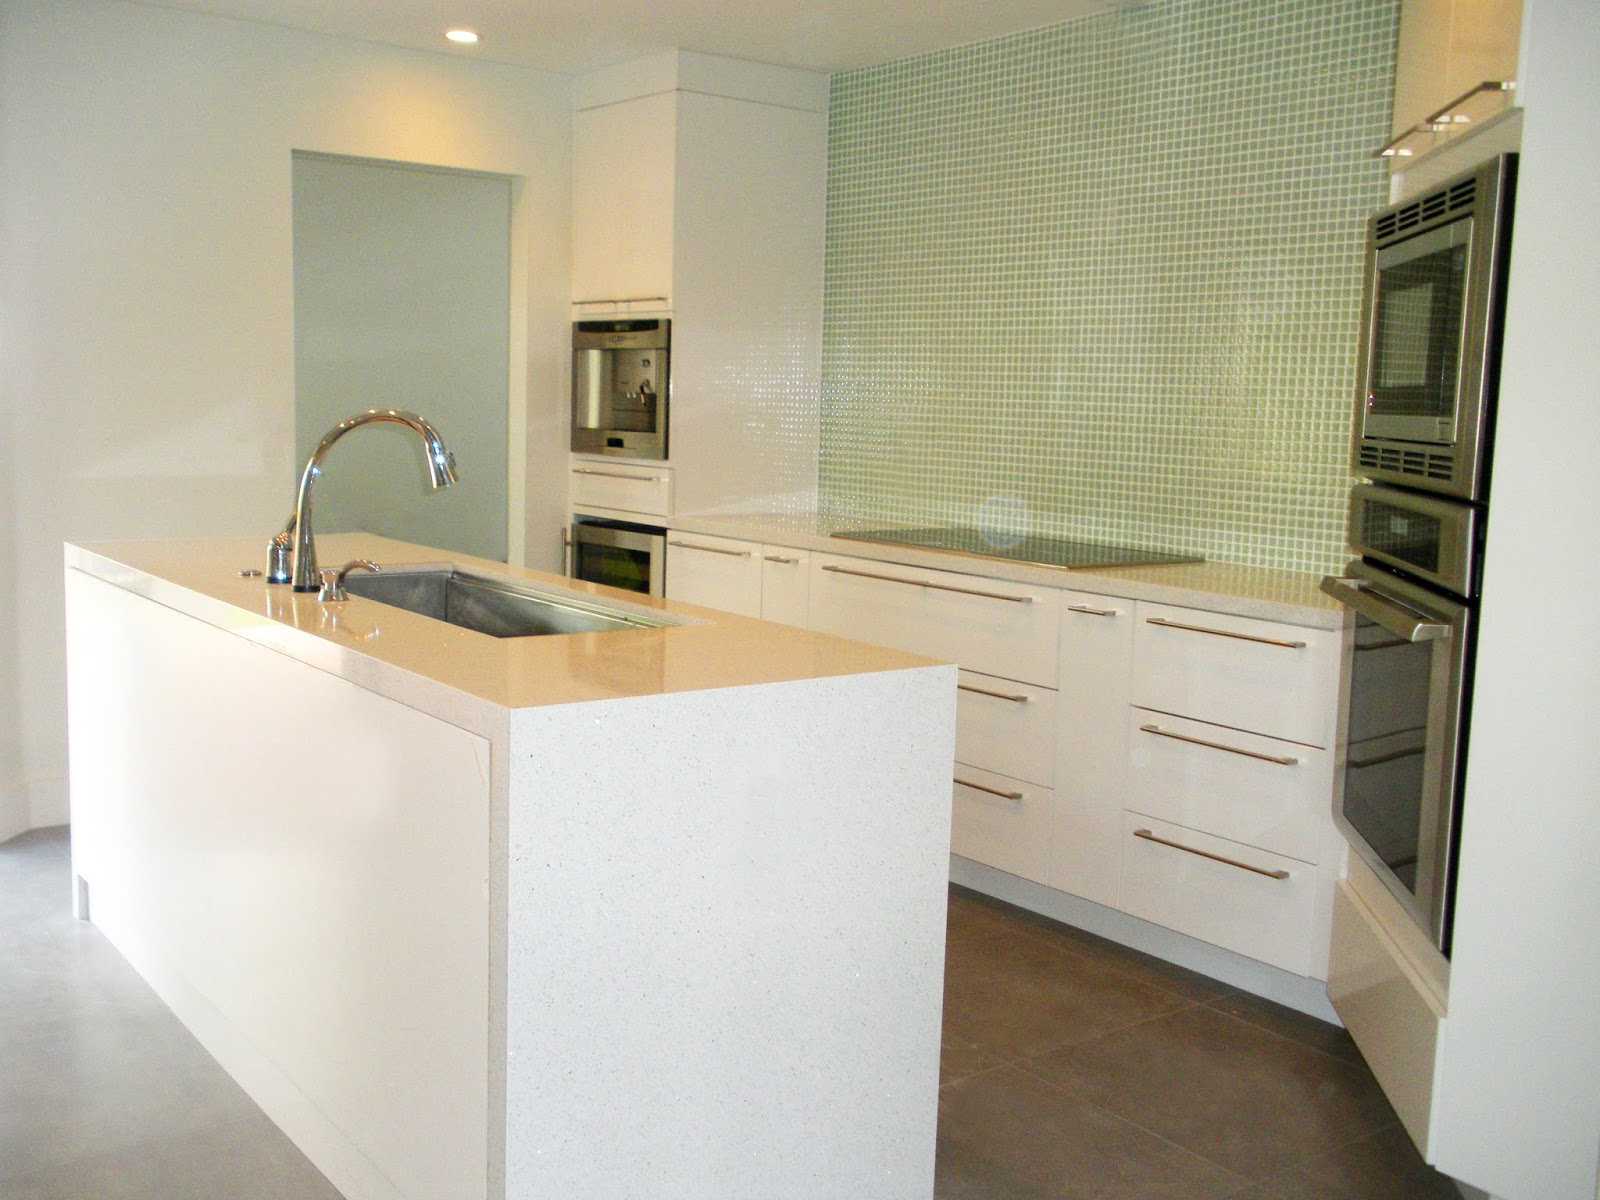 The Latest Trend For Kitchen Countertops Quartz Stone